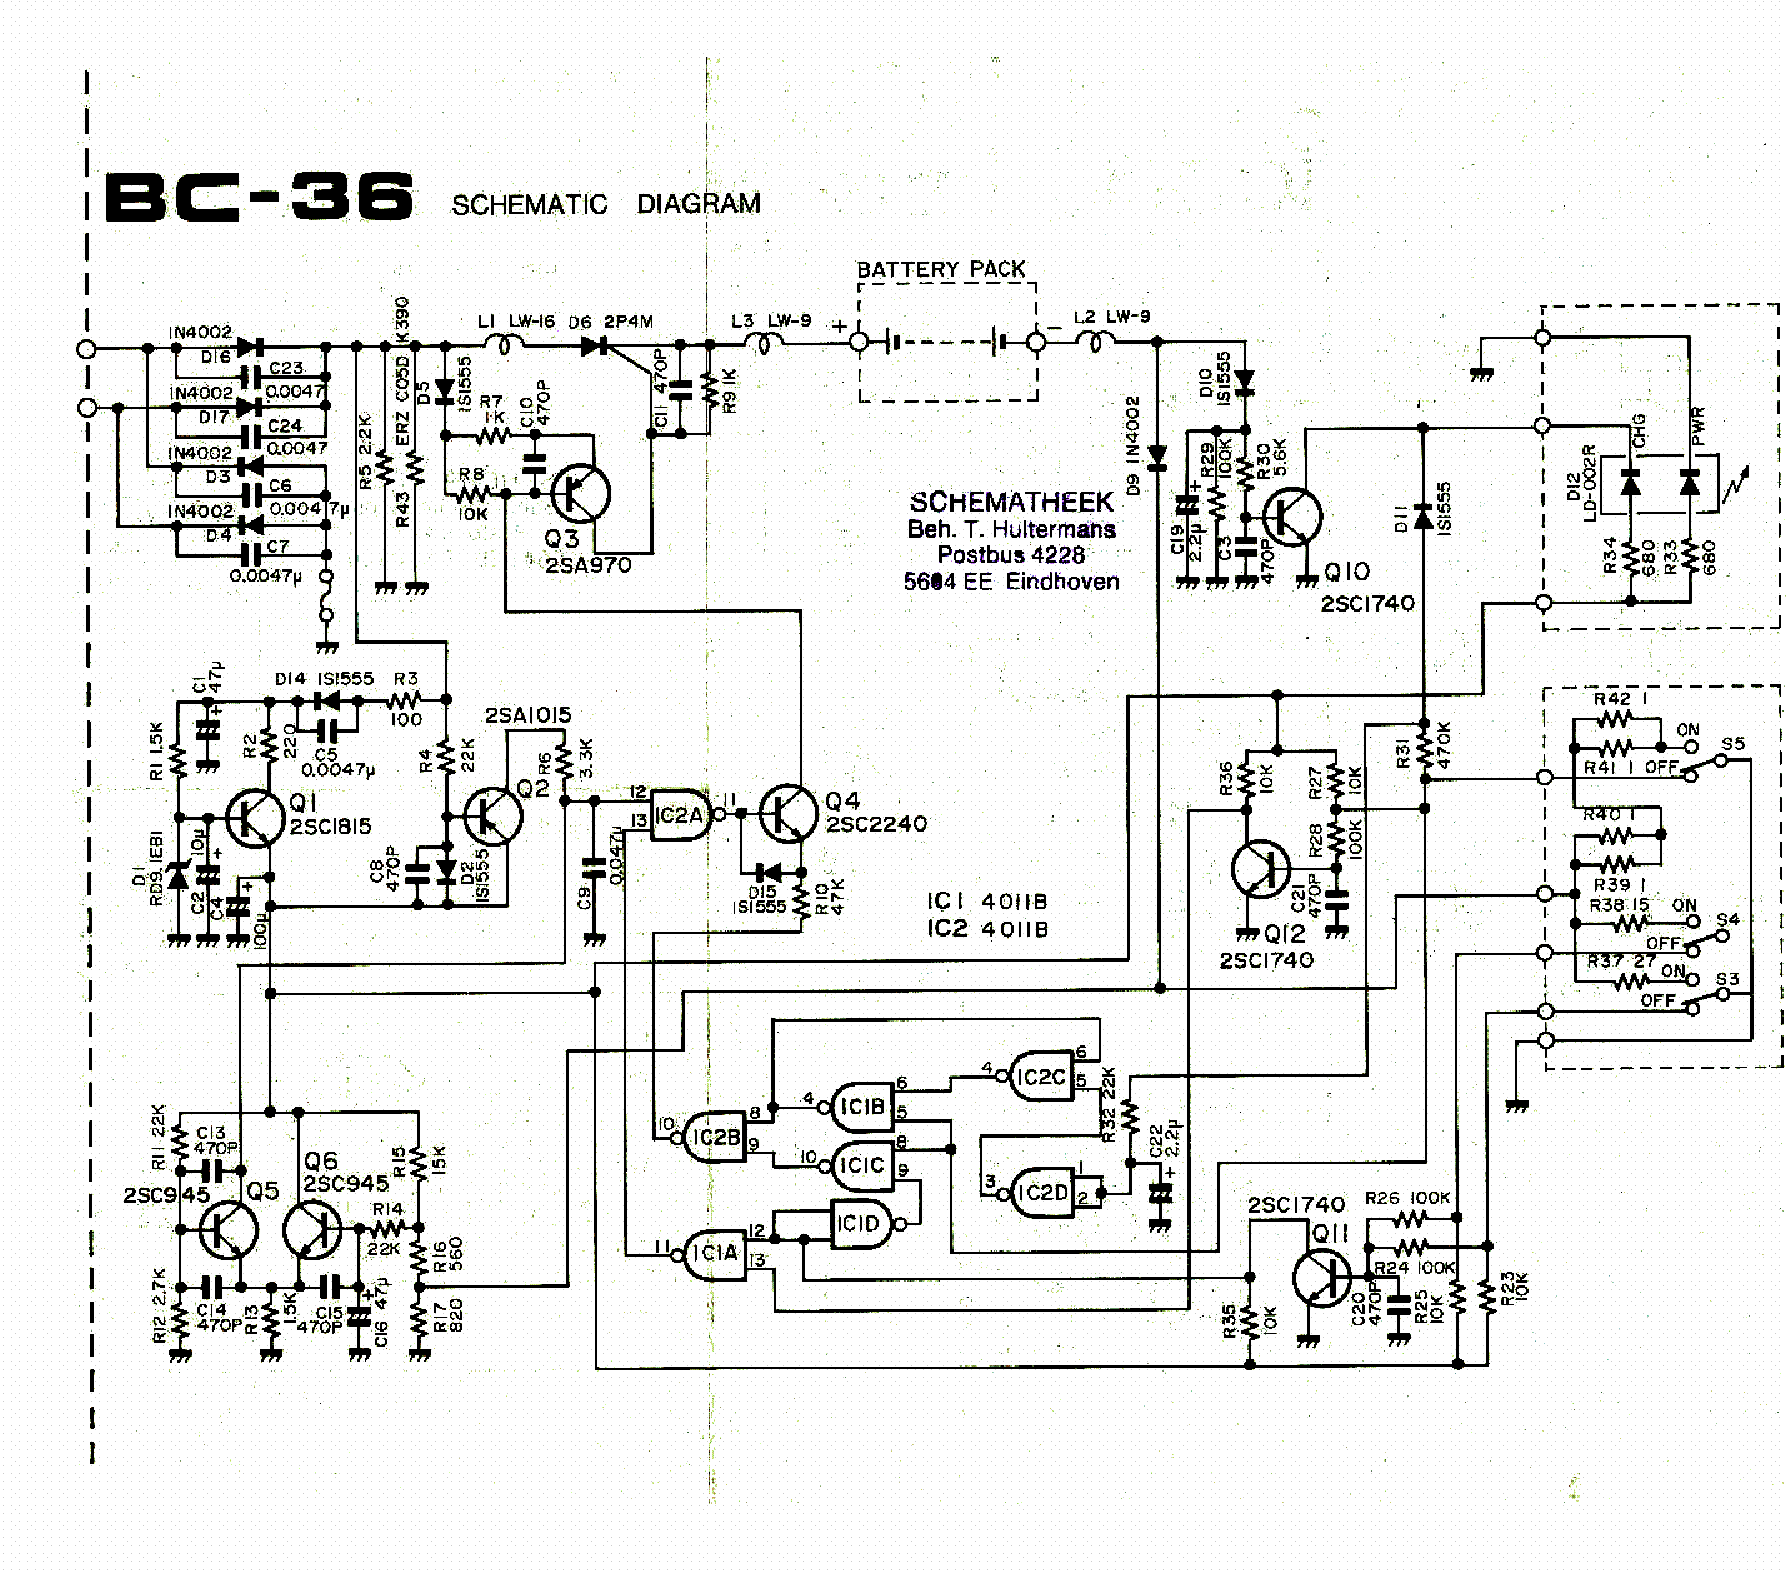 ICOM BC-36 service manual (1st page)